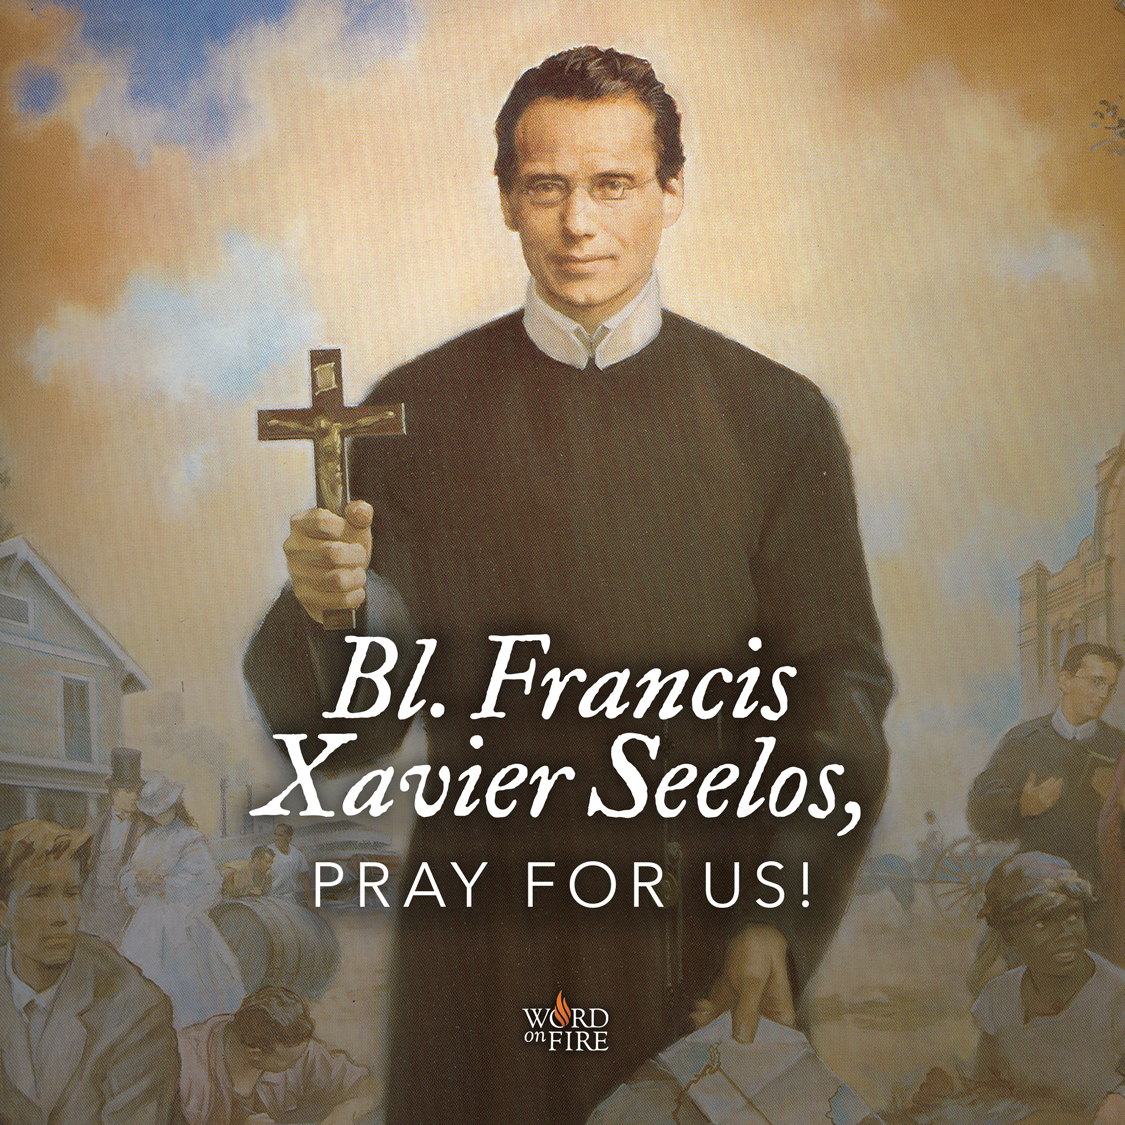 PrayerGraphics com » Bl  Francis Xavier Seelos, pray for us!